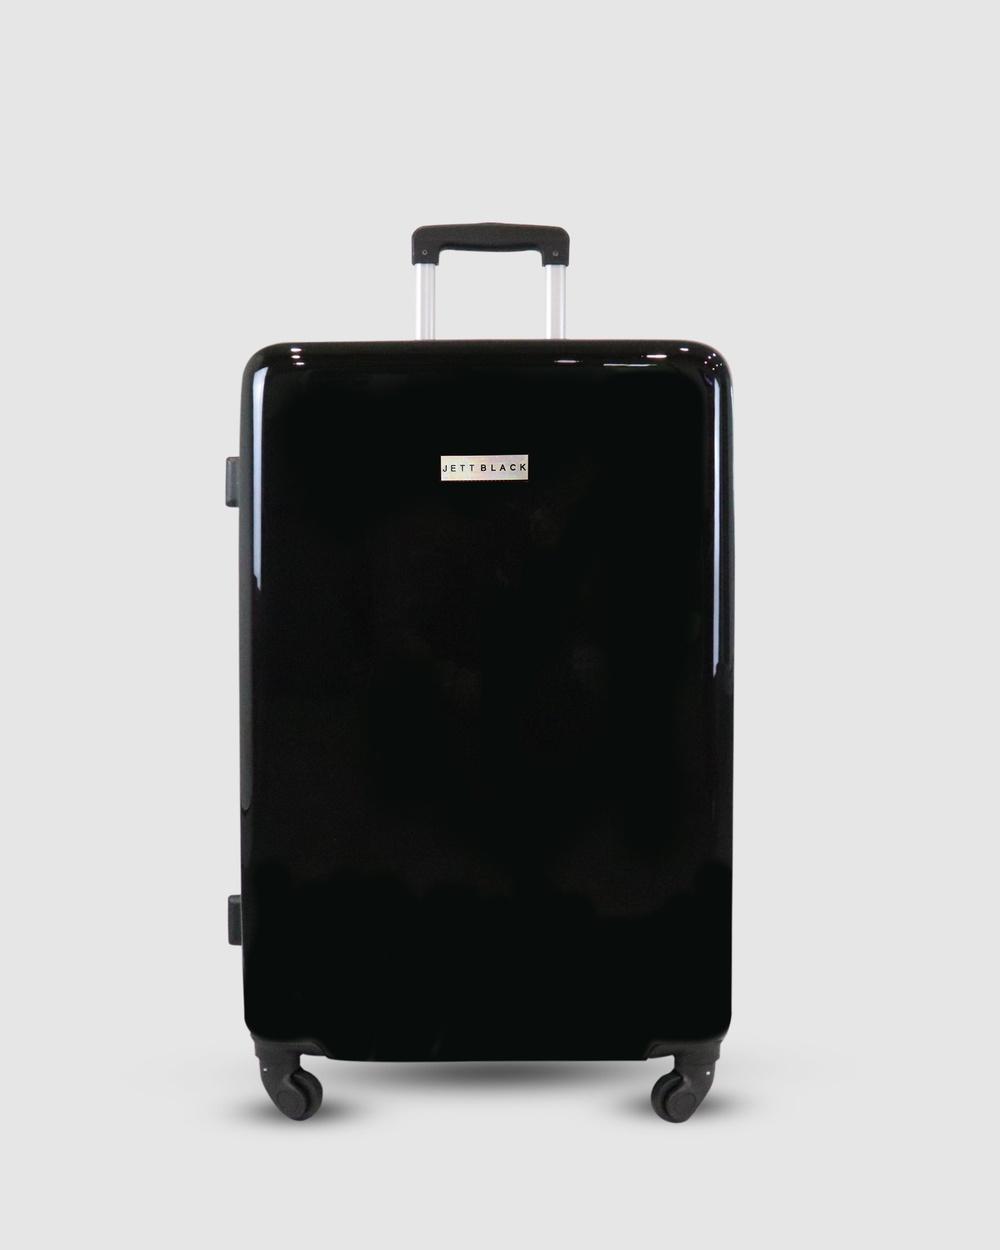 JETT BLACK My JB Series Medium Suitcase Travel and Luggage Black